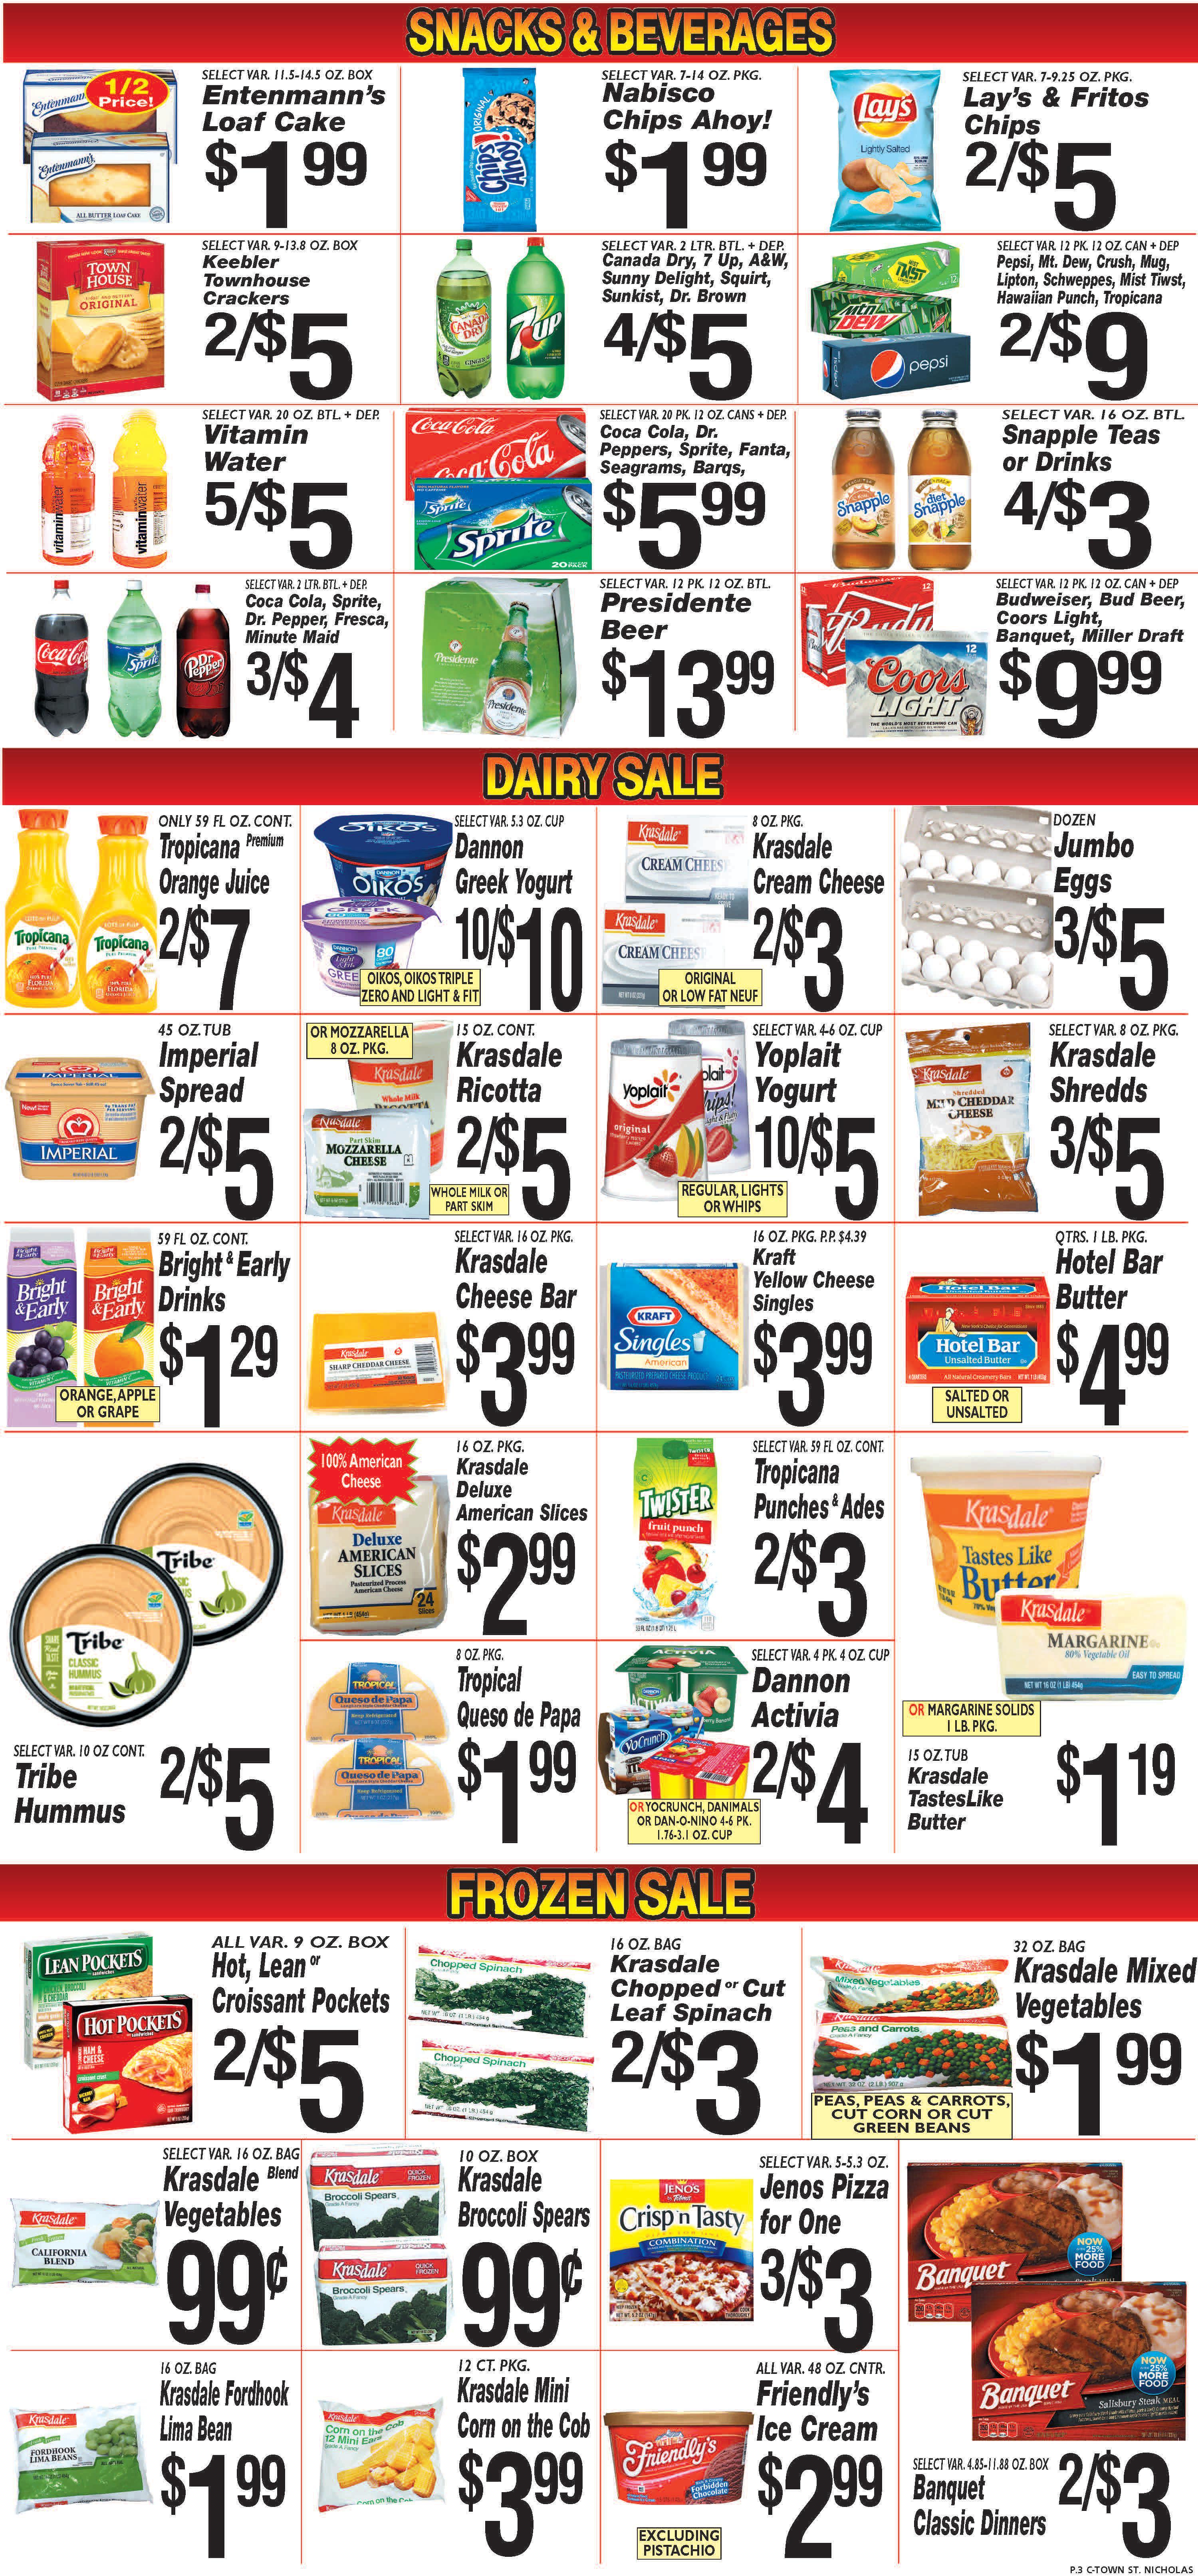 C-Town Supermarket image 2